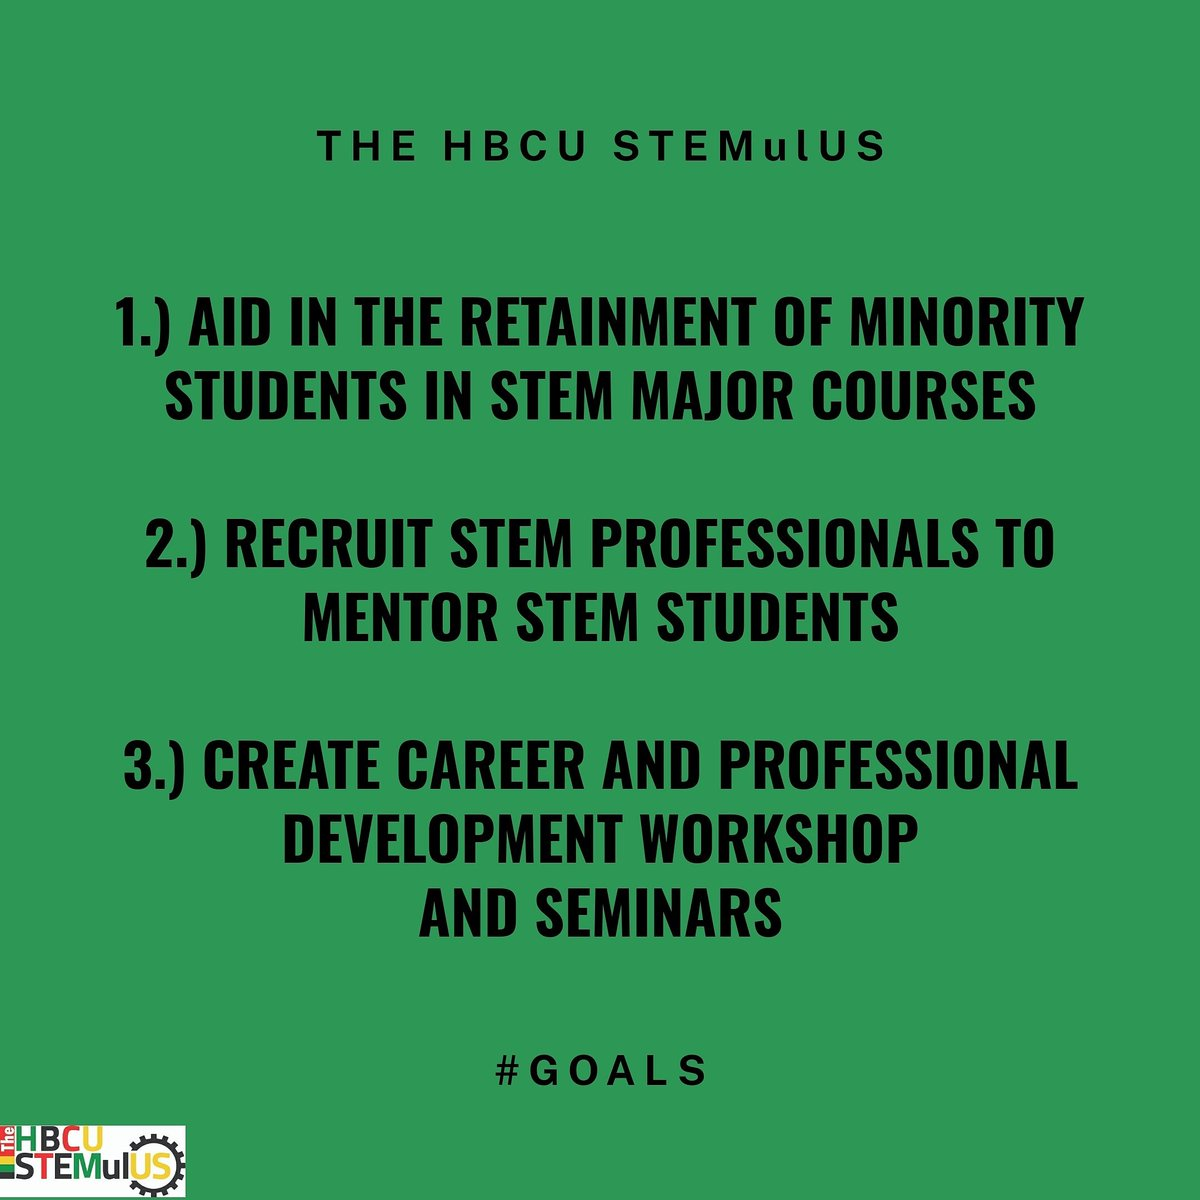 Our goals. --   #Goals #organization #stem #hbcustem #hbcualum #hbcupride #blackinstem #minoritiesinstem #womeninstem #meninstem #science #technology #engineering #math https://t.co/vvRXHUc9MV